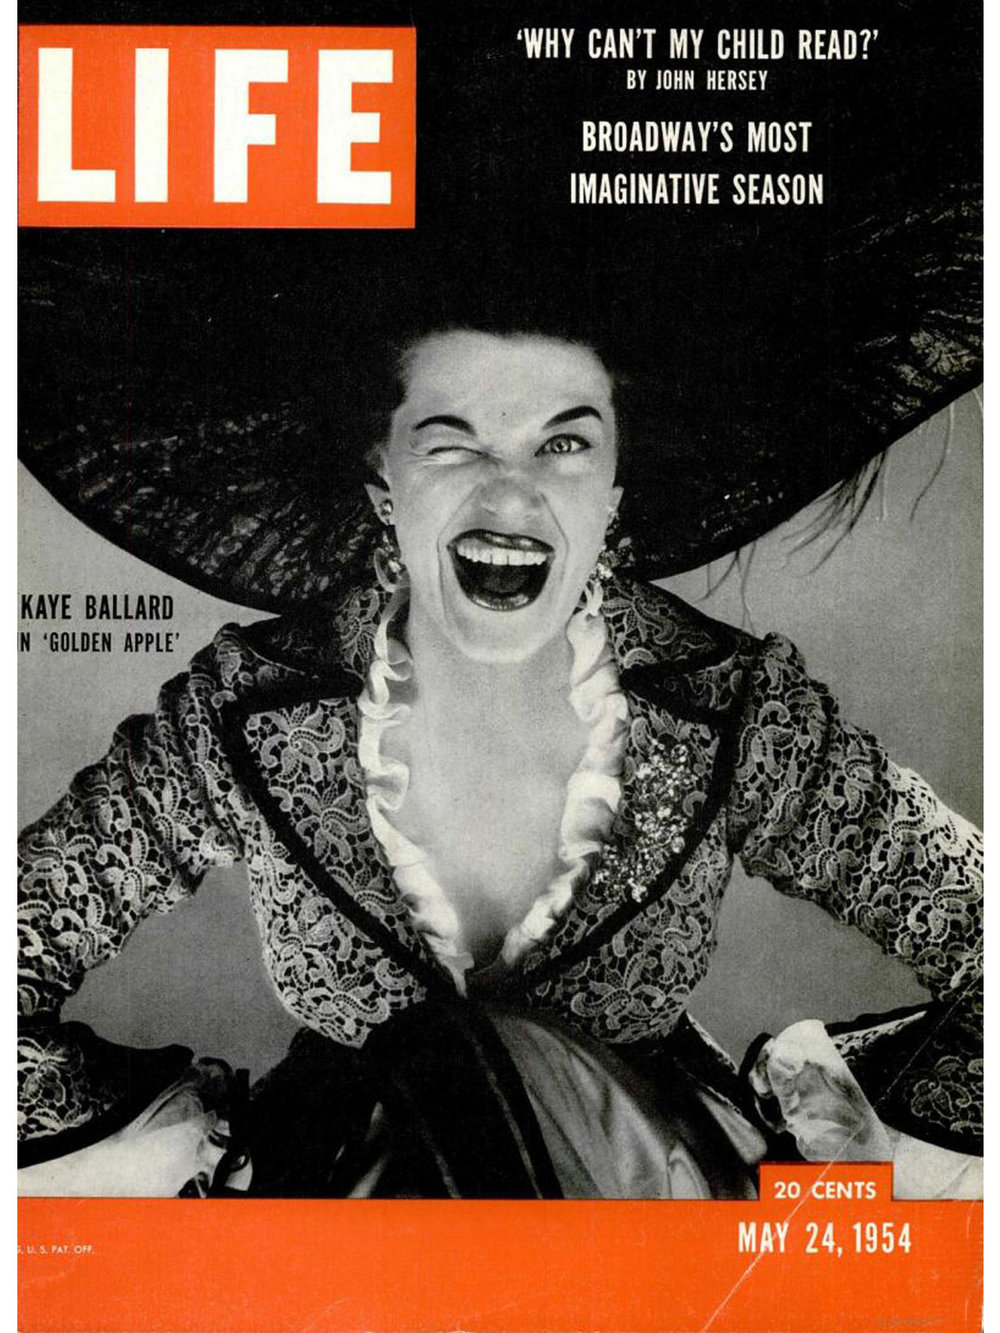 1954 LIFE May 24, 1954-Cover.jpg